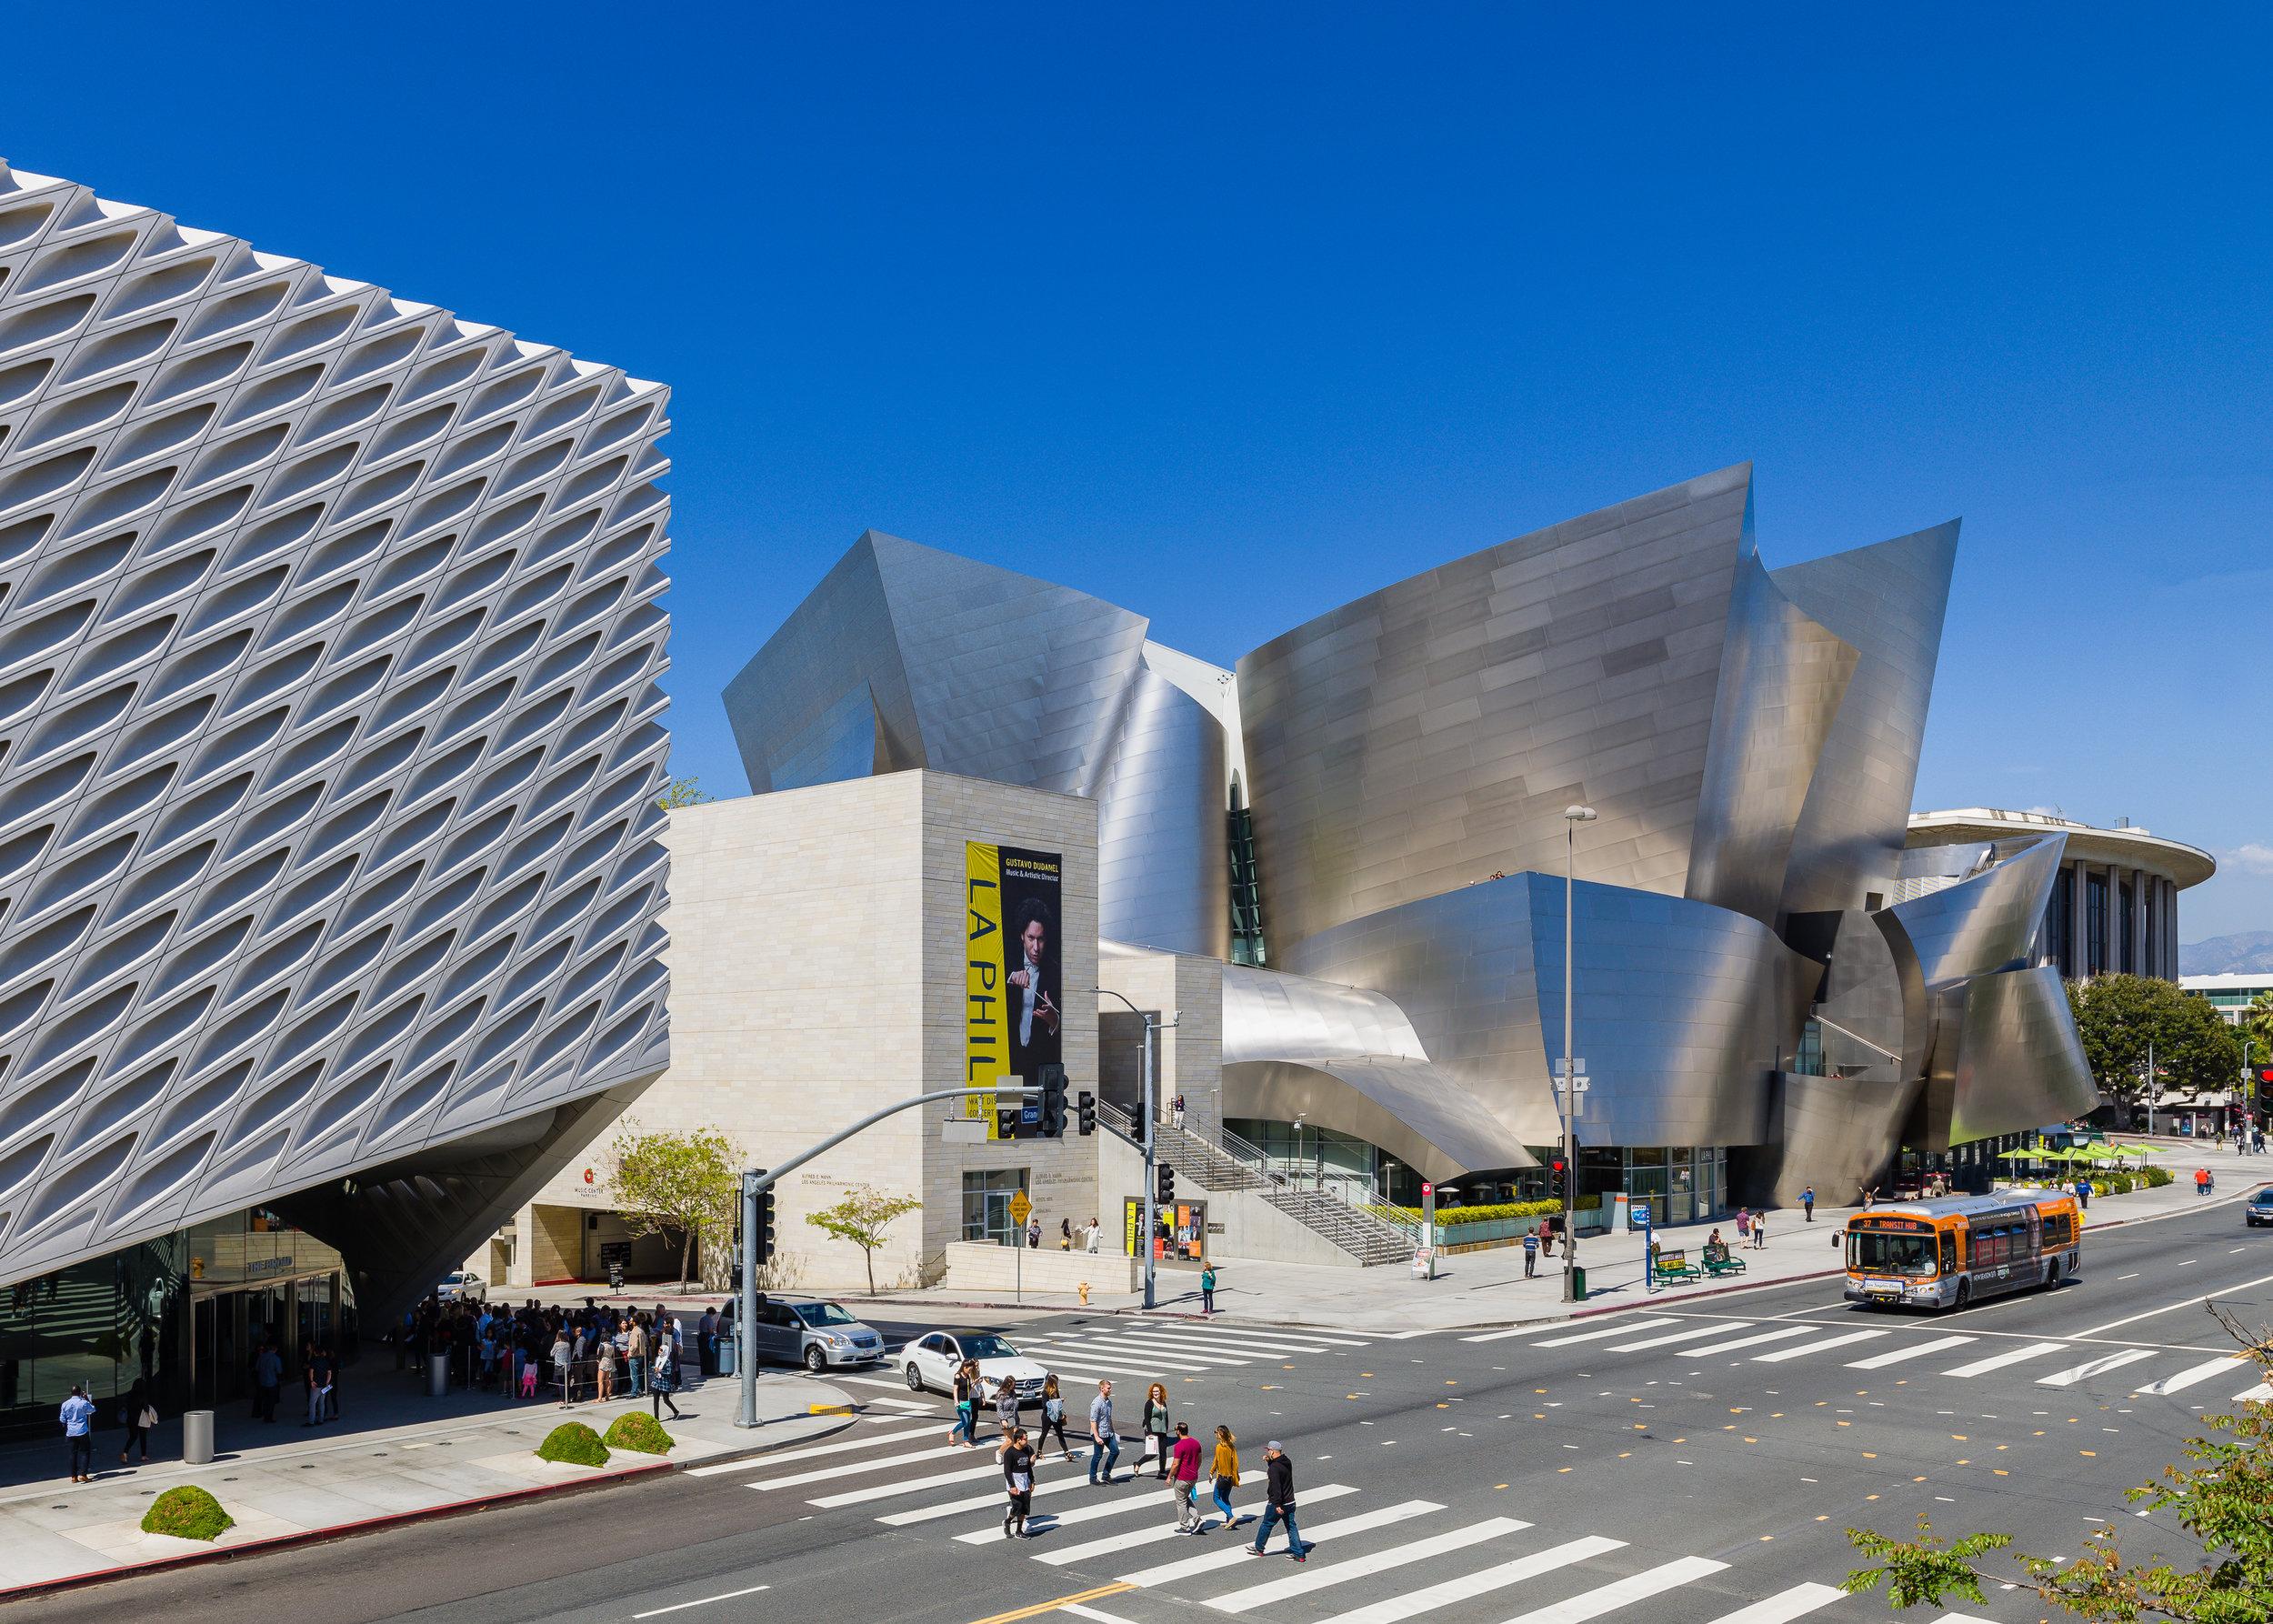 2016 Broad_Disney Concert Hall-230-Edit.jpg